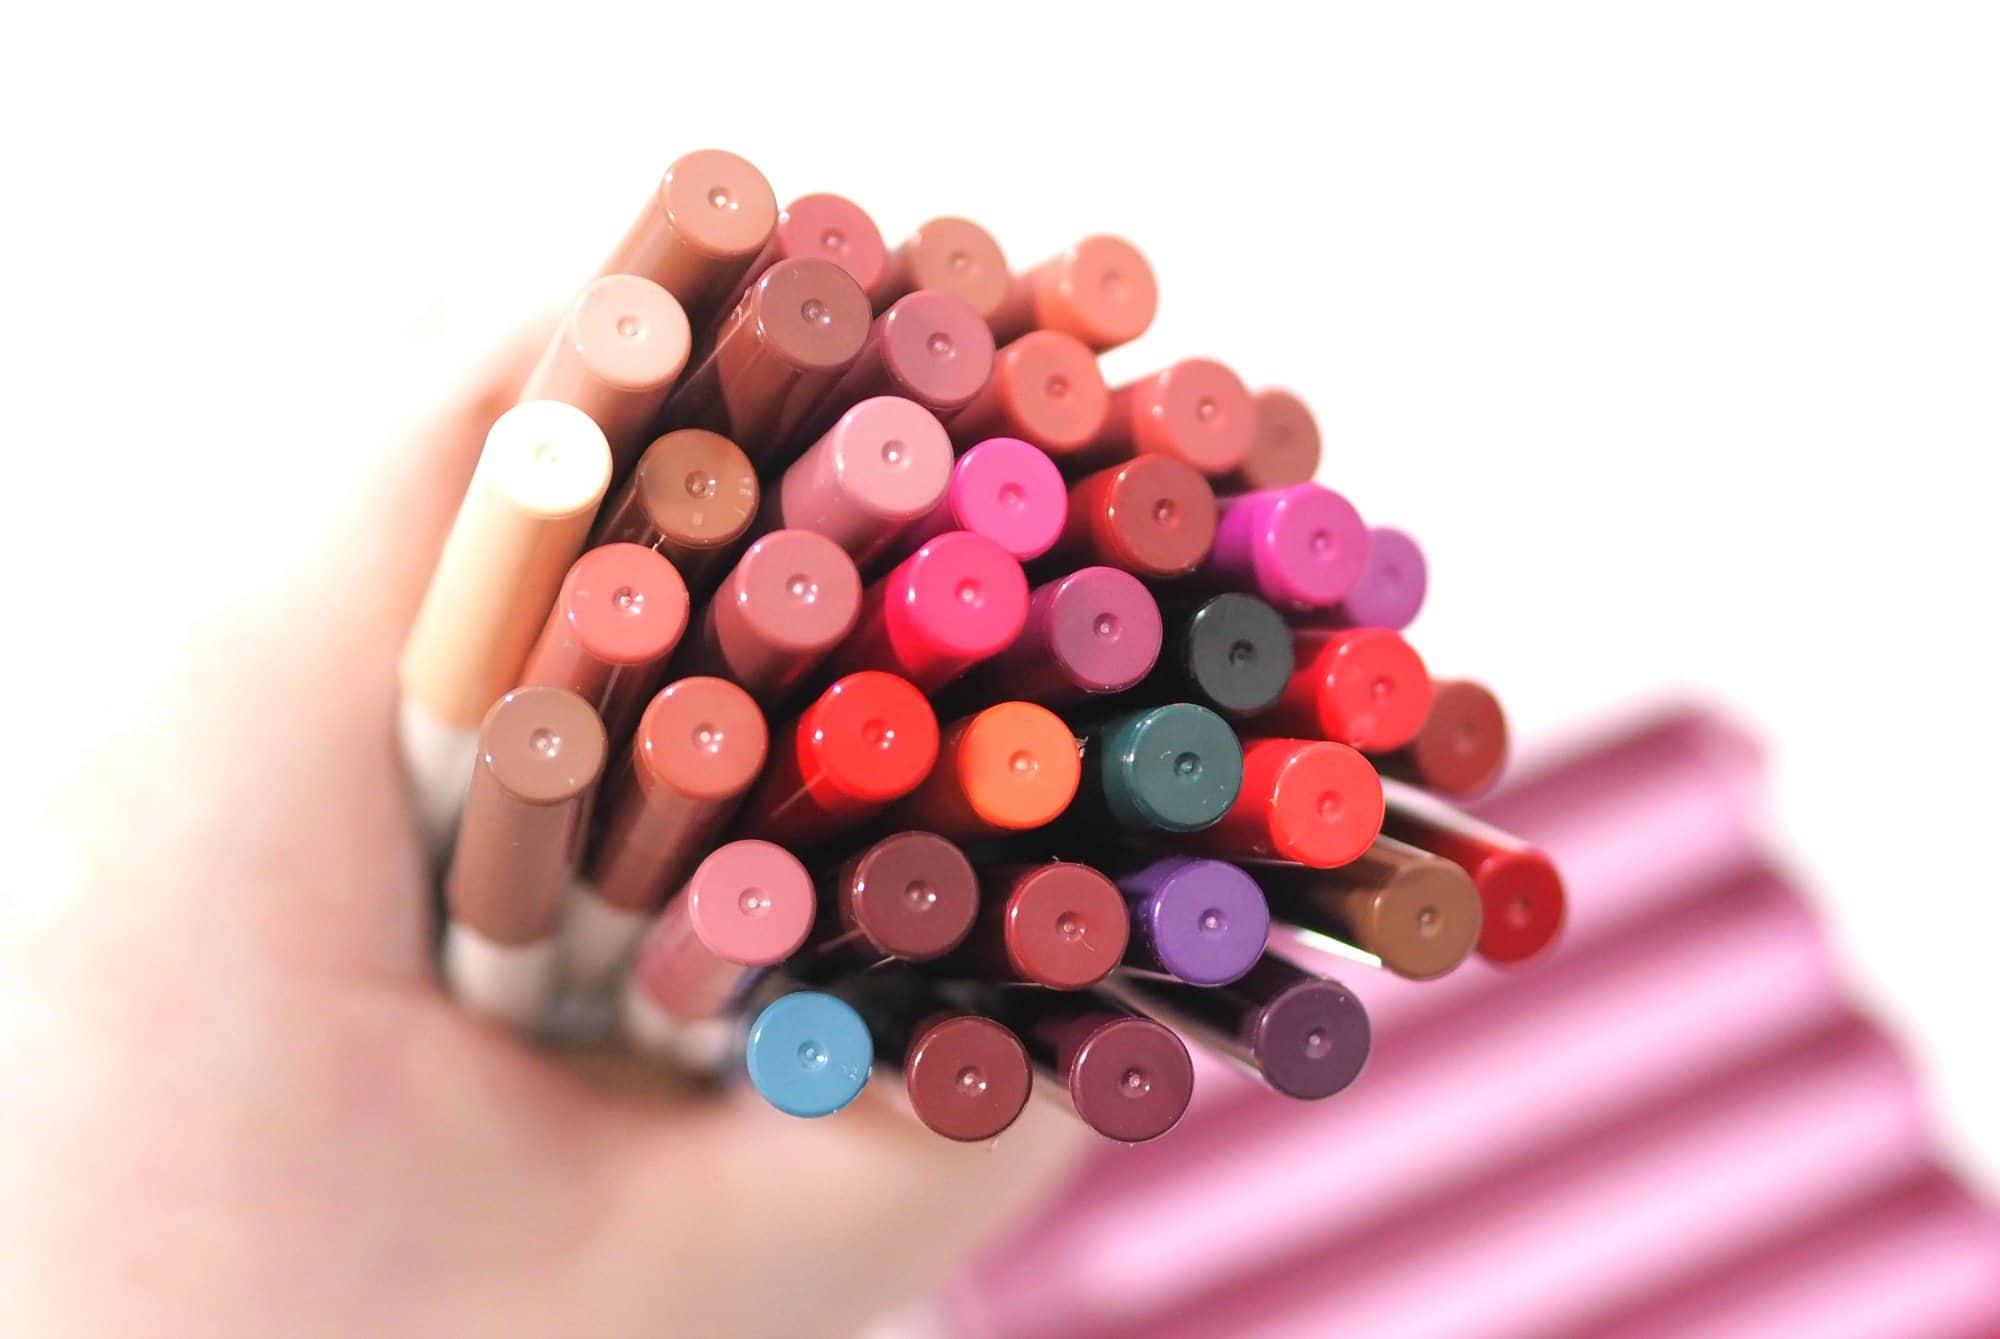 The Big Box Of Lippie Pencils by Colourpop #19